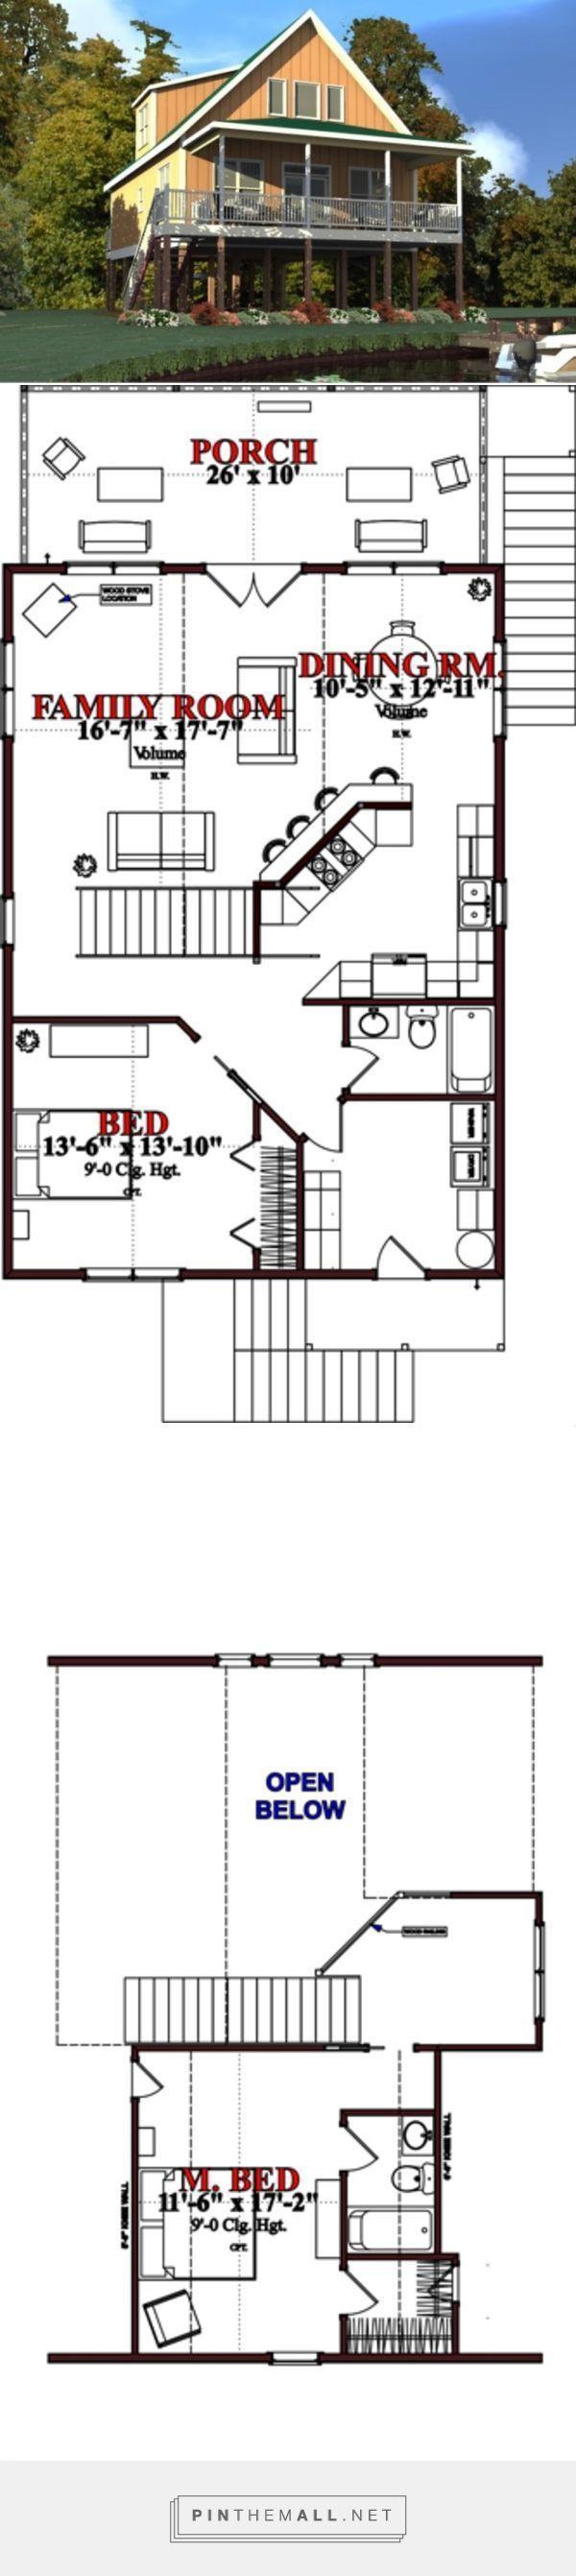 Atemberaubend Hampton Bay Decke Verdrahtung Diagramm Bilder ...